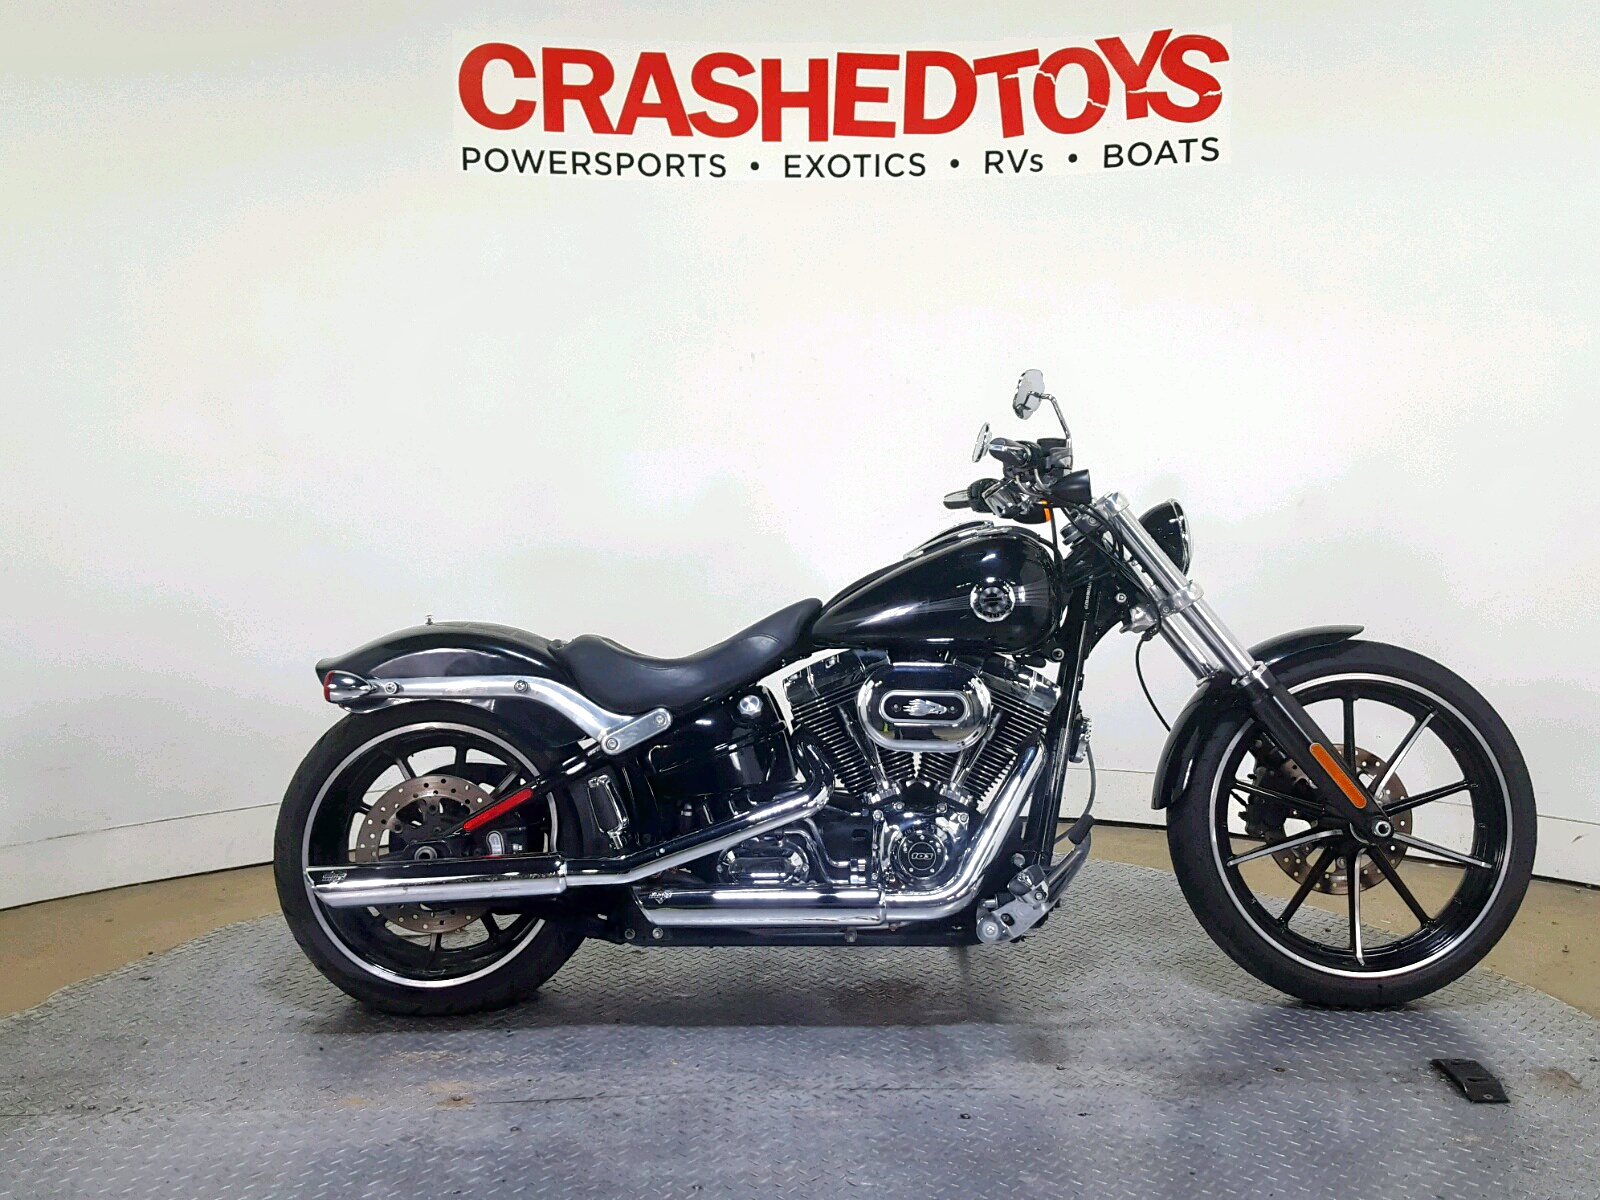 Salvage 2013 Harley-Davidson FXSB BREAK for sale